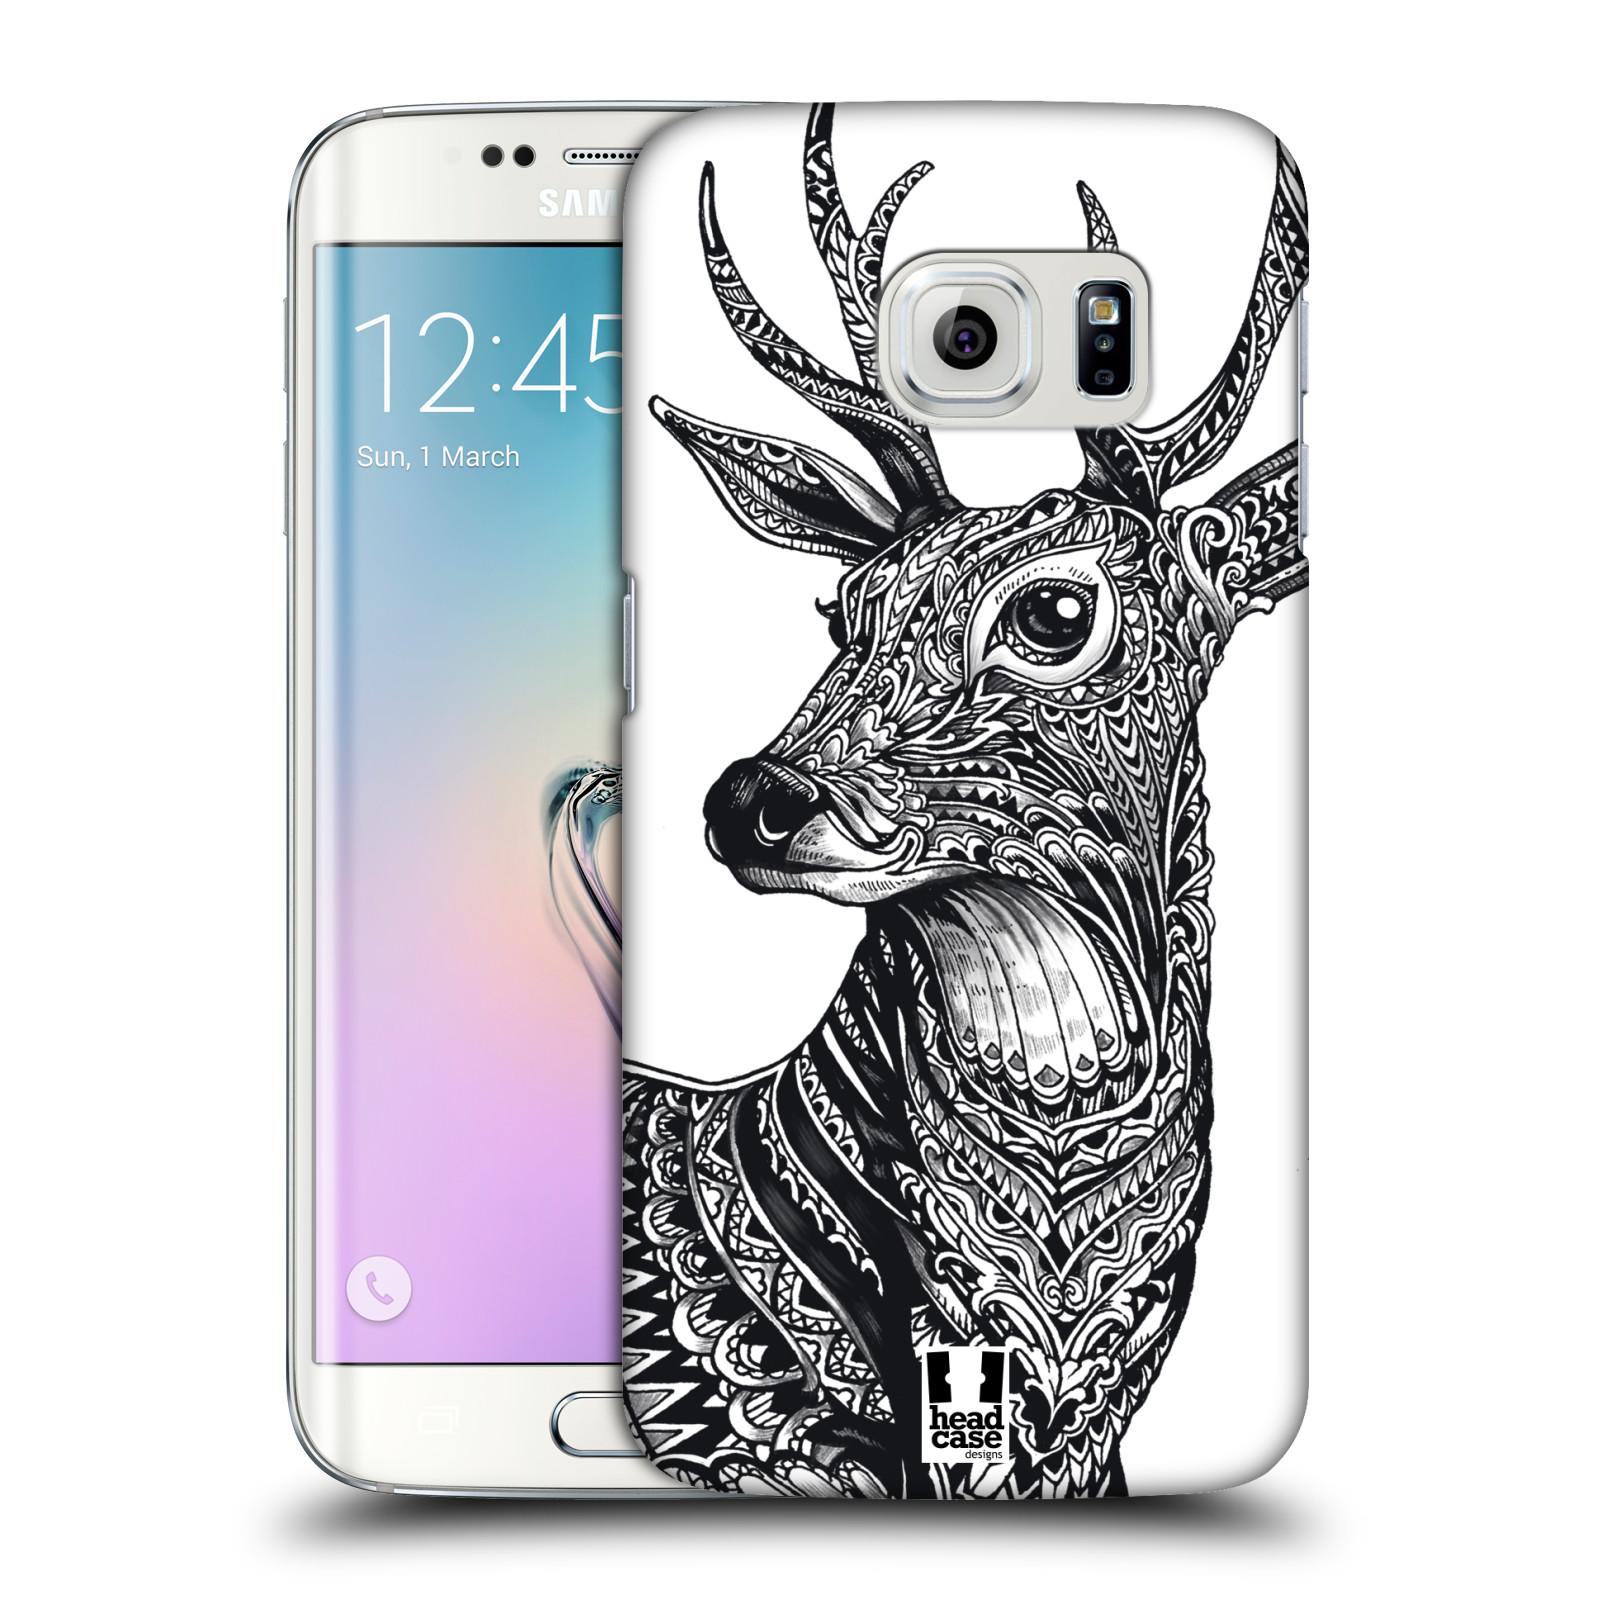 Plastové pouzdro na mobil Samsung Galaxy S6 Edge HEAD CASE Zdobený Jelínek (Plastový kryt či obal na mobilní telefon Samsung Galaxy S6 Edge SM-G925F)